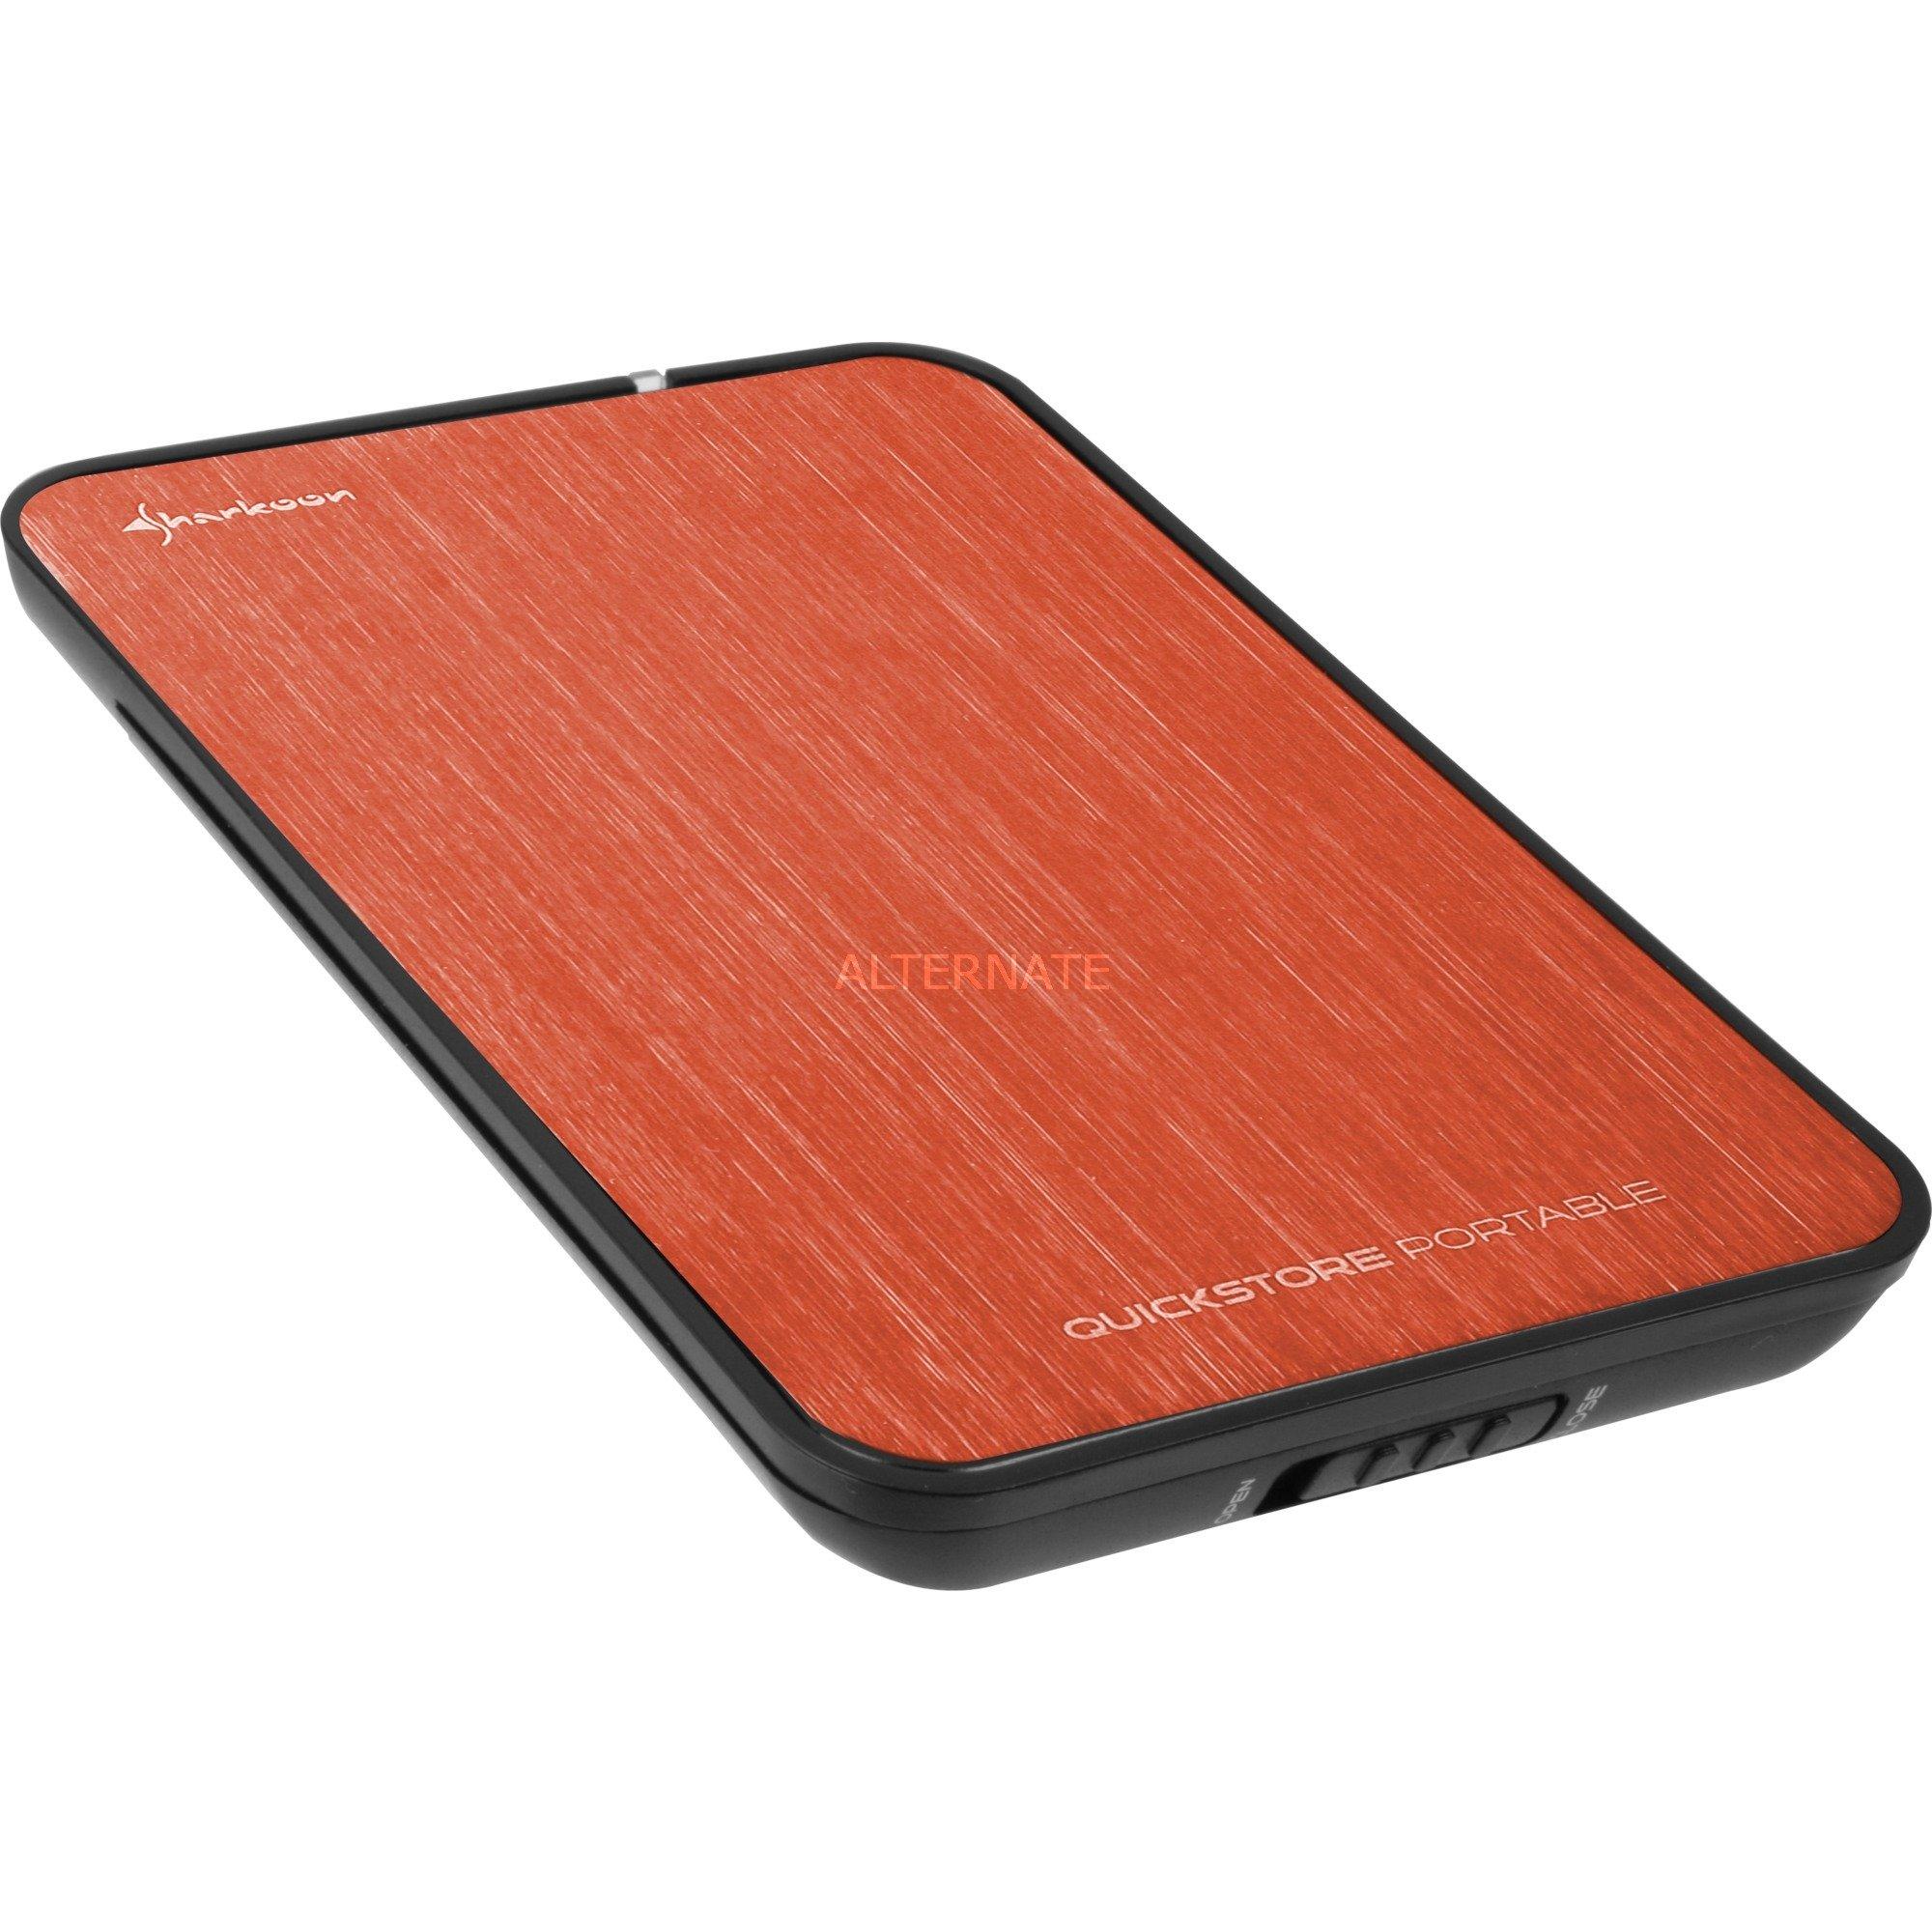 "QuickStore Portable 2.5"" Negro, Rojo, Caja de unidades"